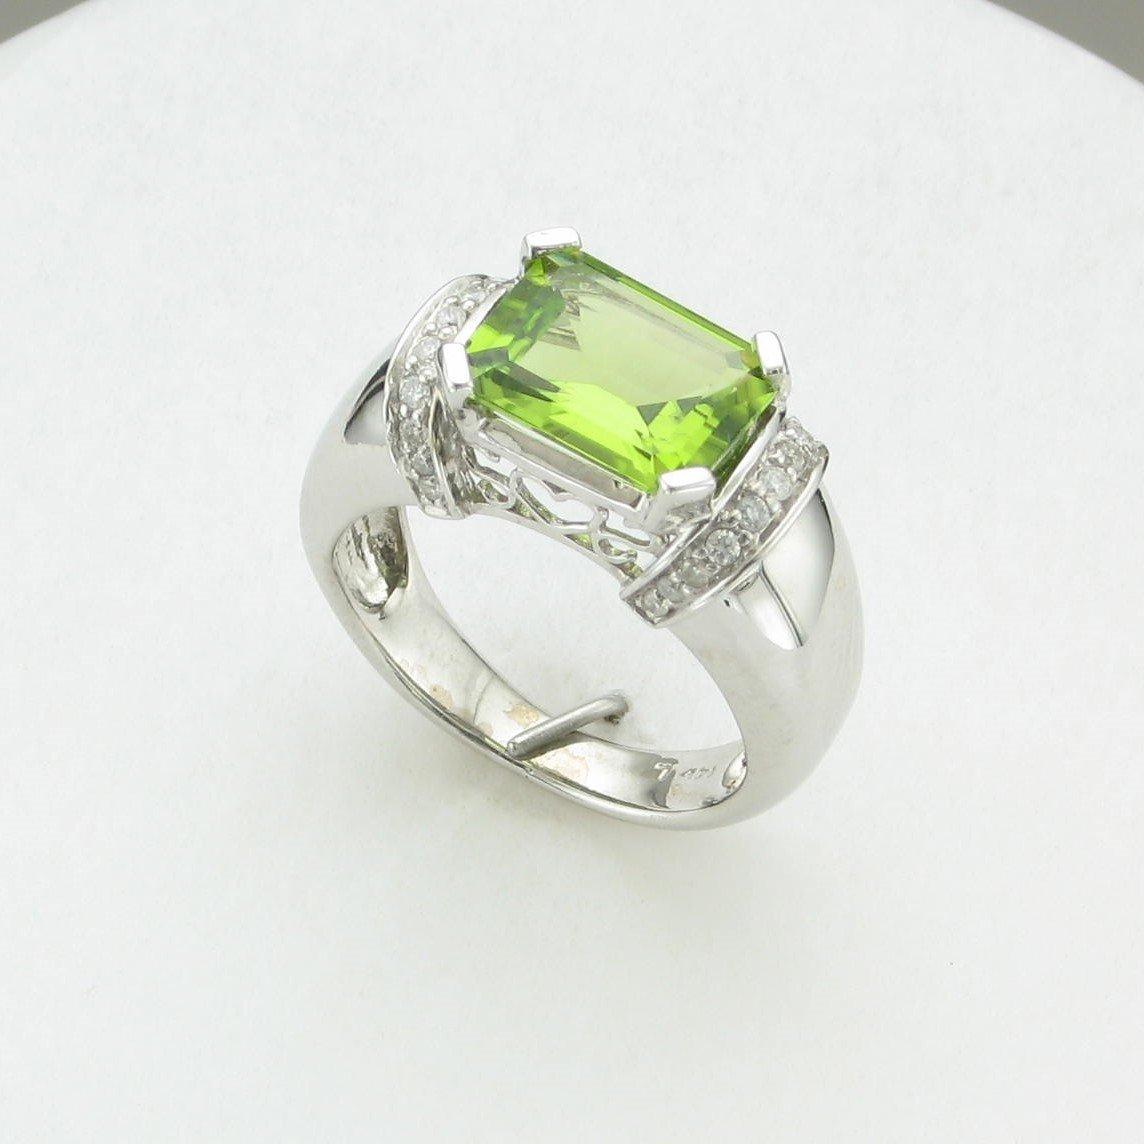 3.65ct Arizona Peridot & Diamond Ring set in 14k White Gold